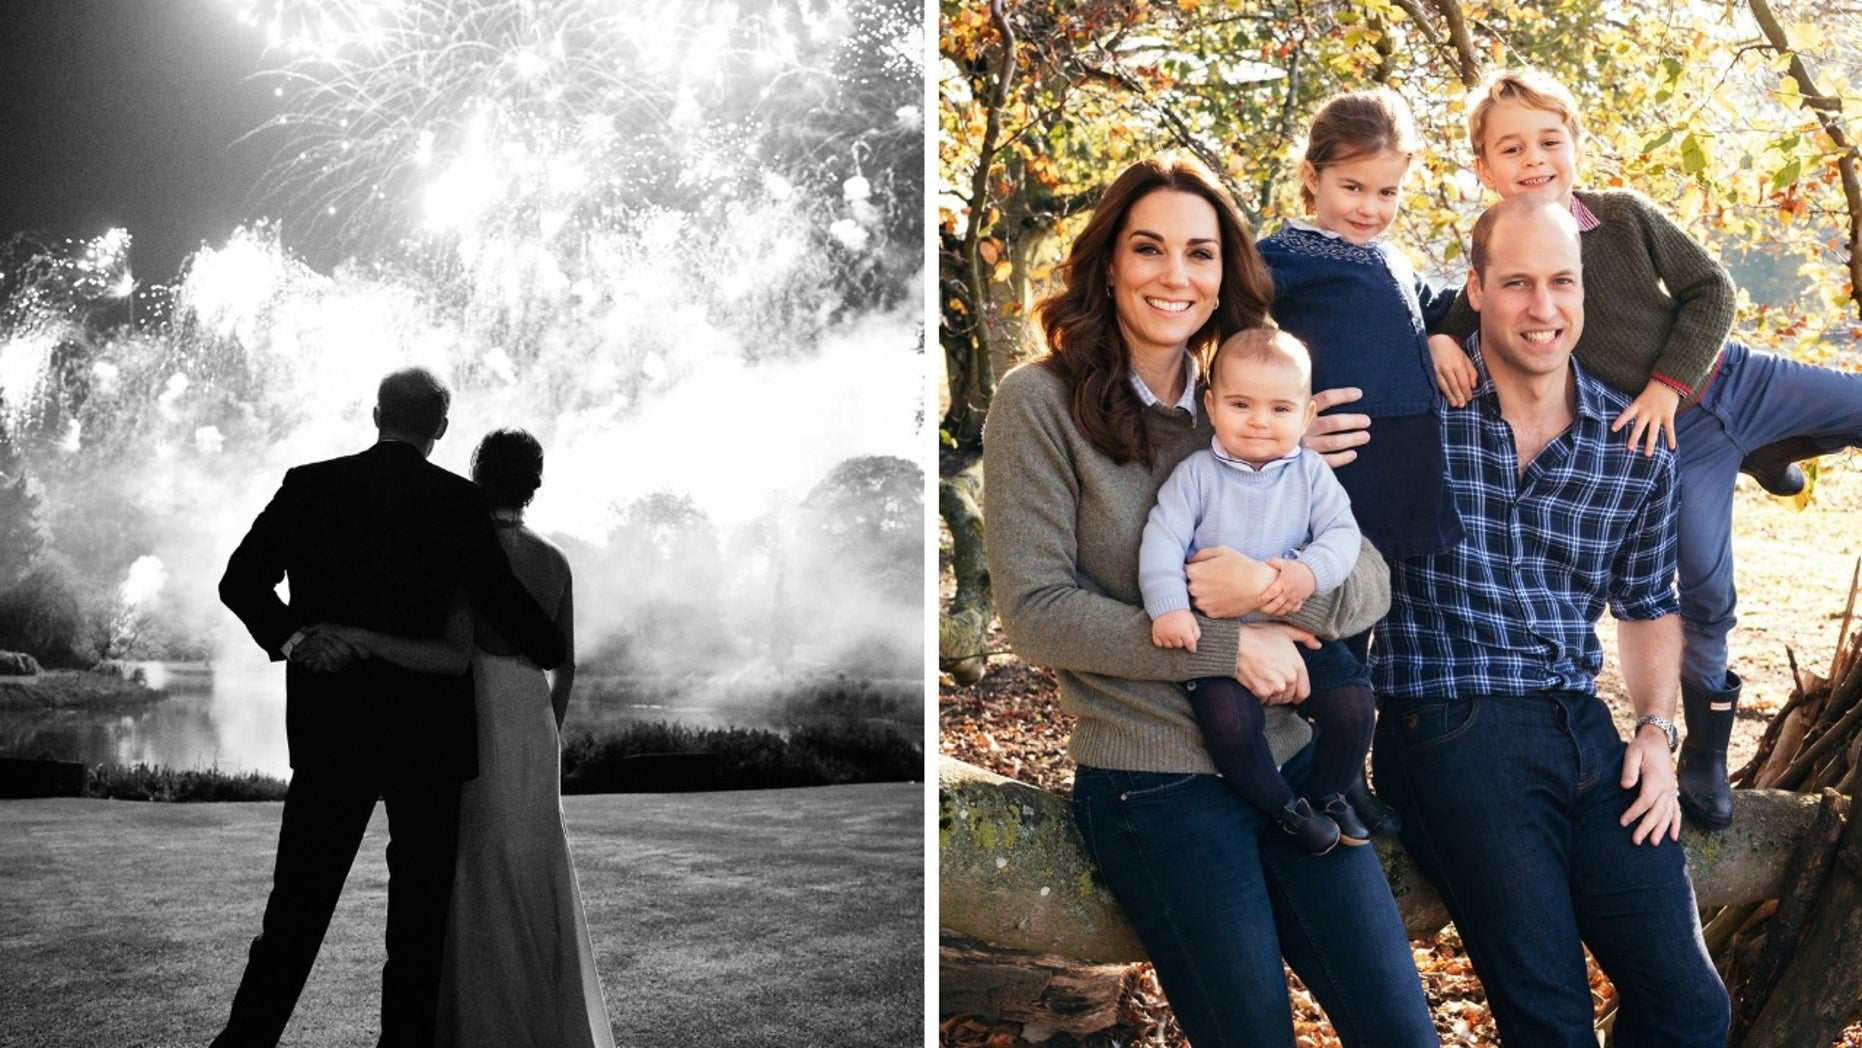 Meghan Markle Christmas.Meghan Markle Prince Harry Prince William And Kate